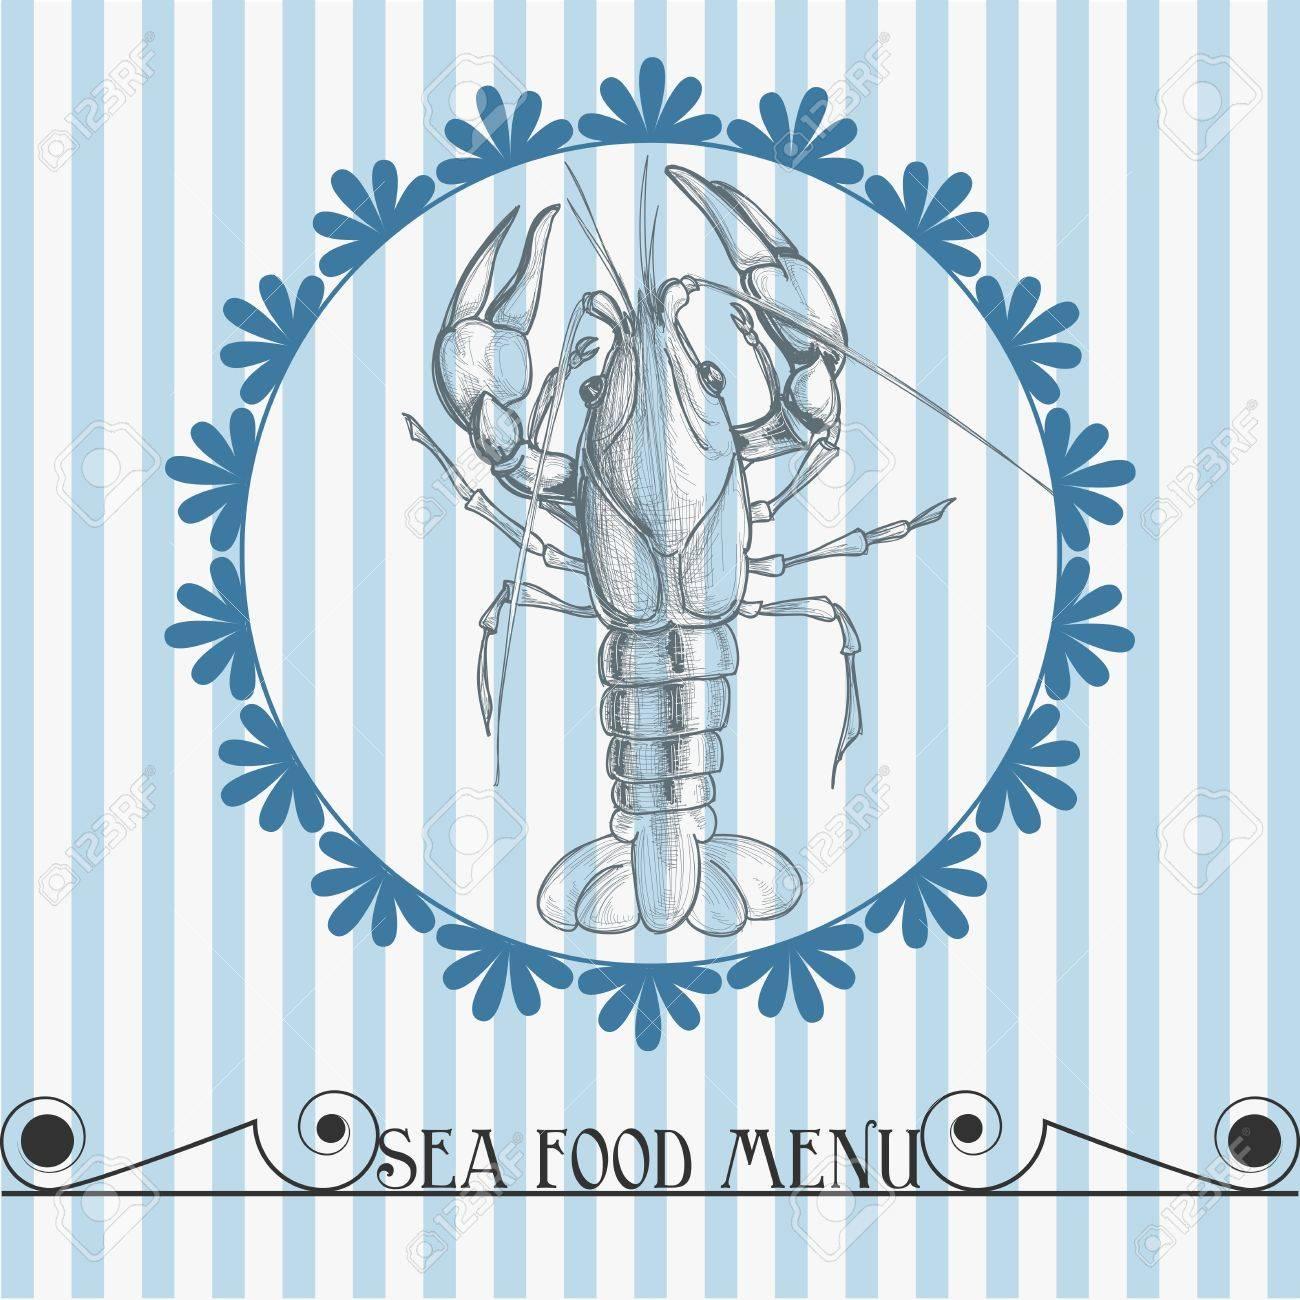 Sea food vector menu lobster drawing Stock Vector - 12144247